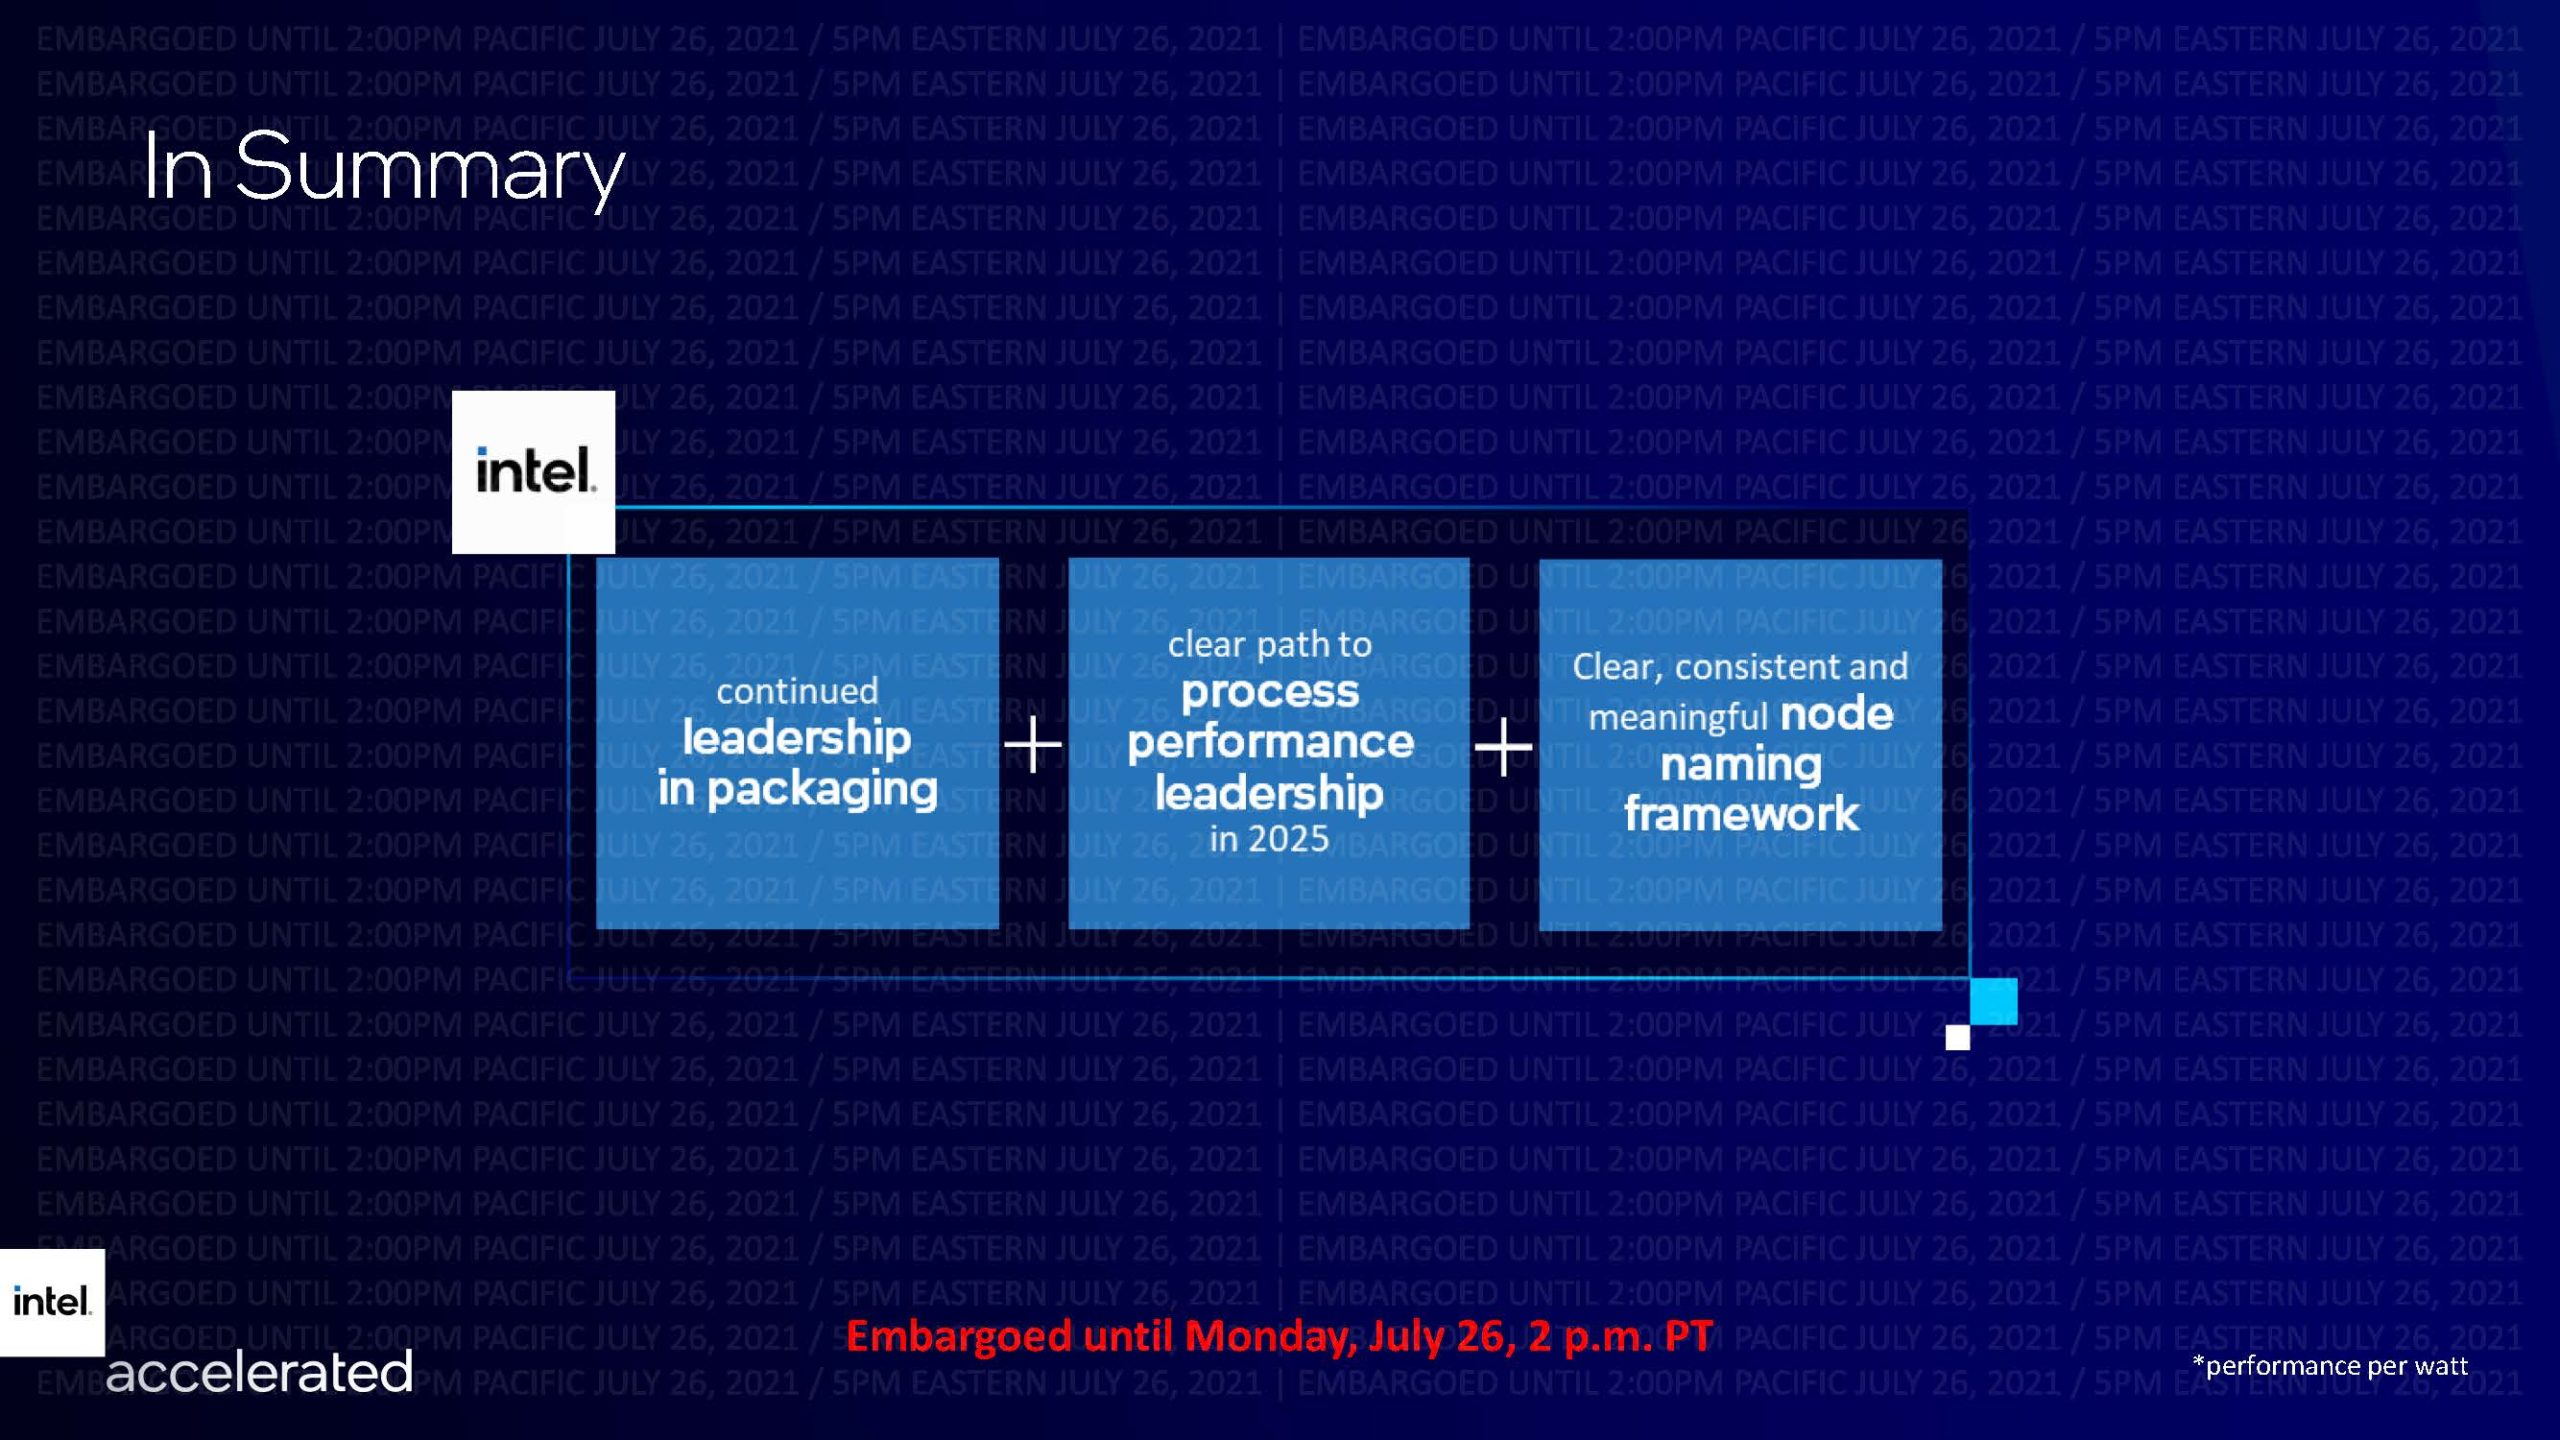 Intel Accelerated Targeting Process Leadership In 2025